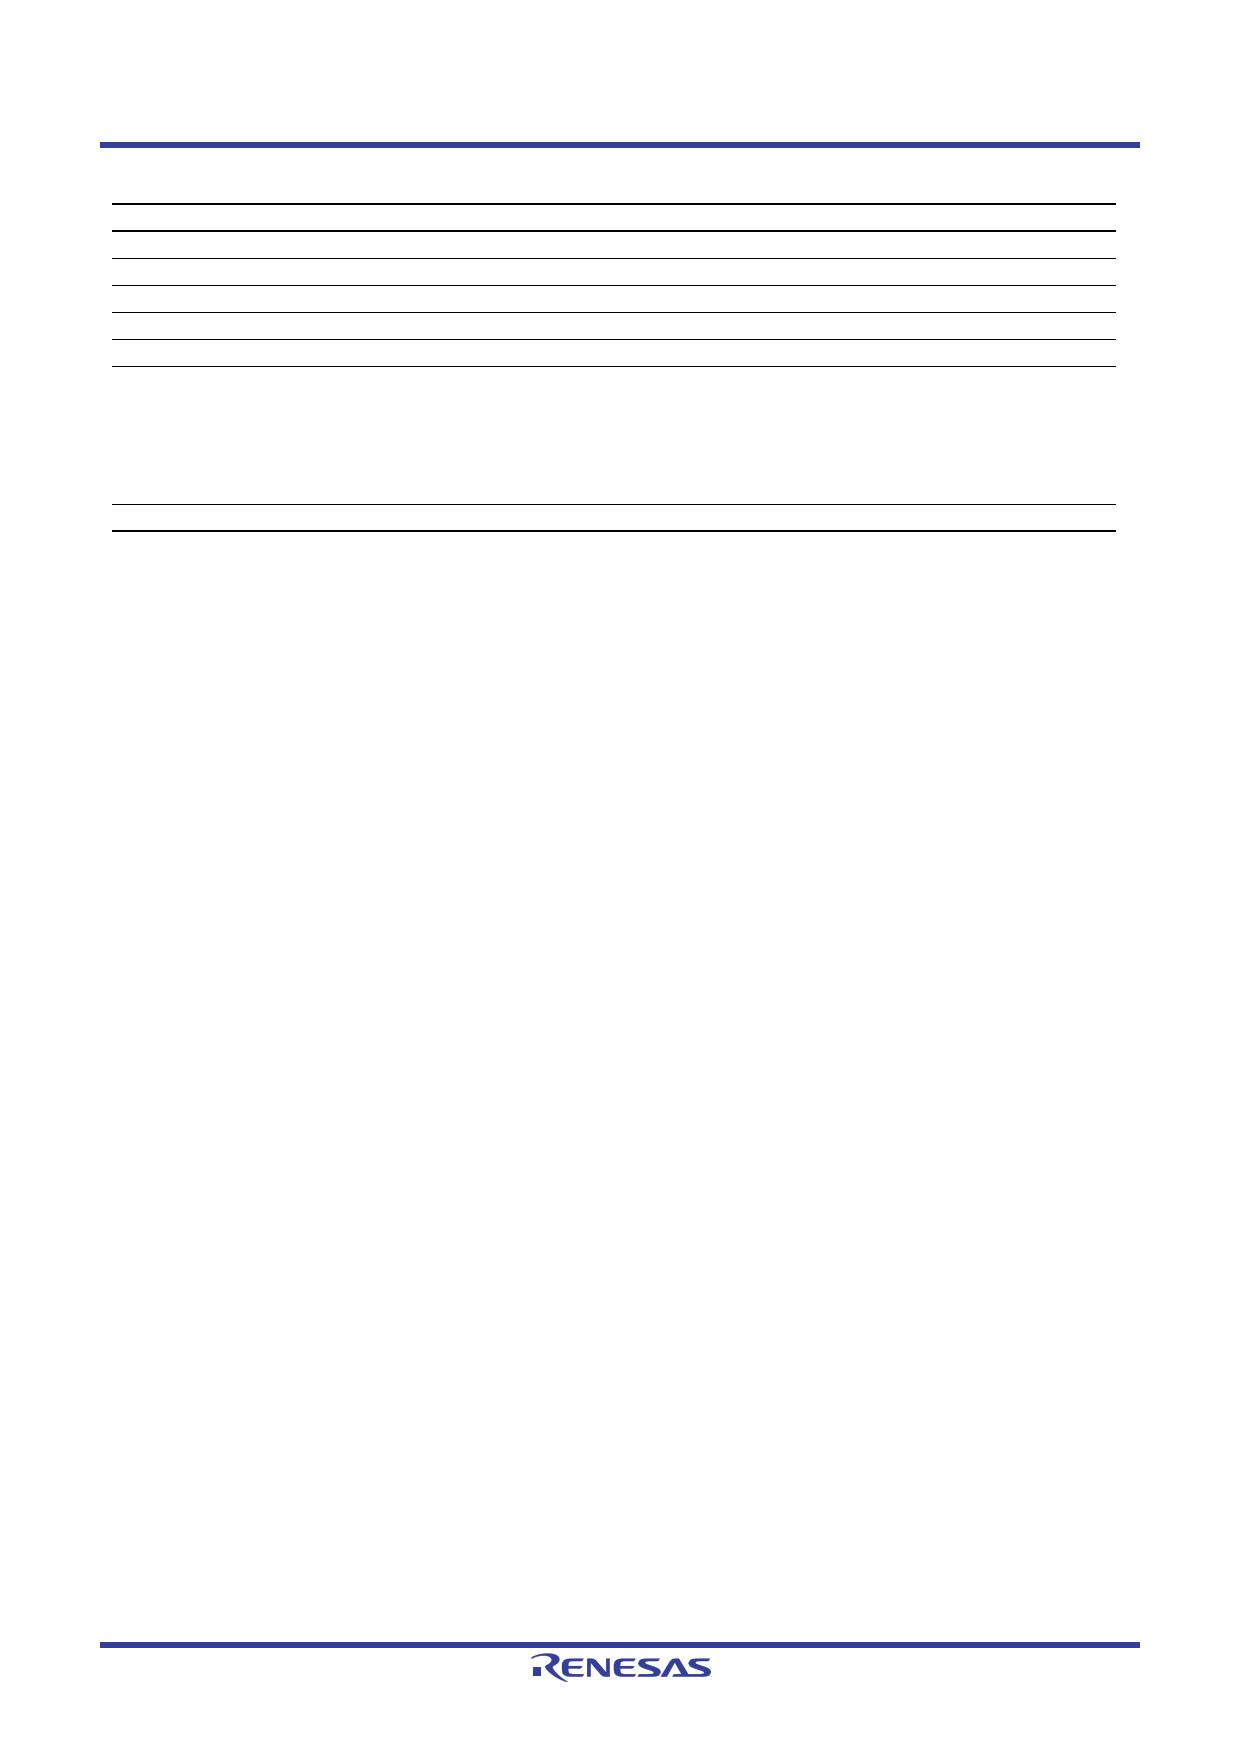 R5F5110HAGNF pdf, 반도체, 판매, 대치품